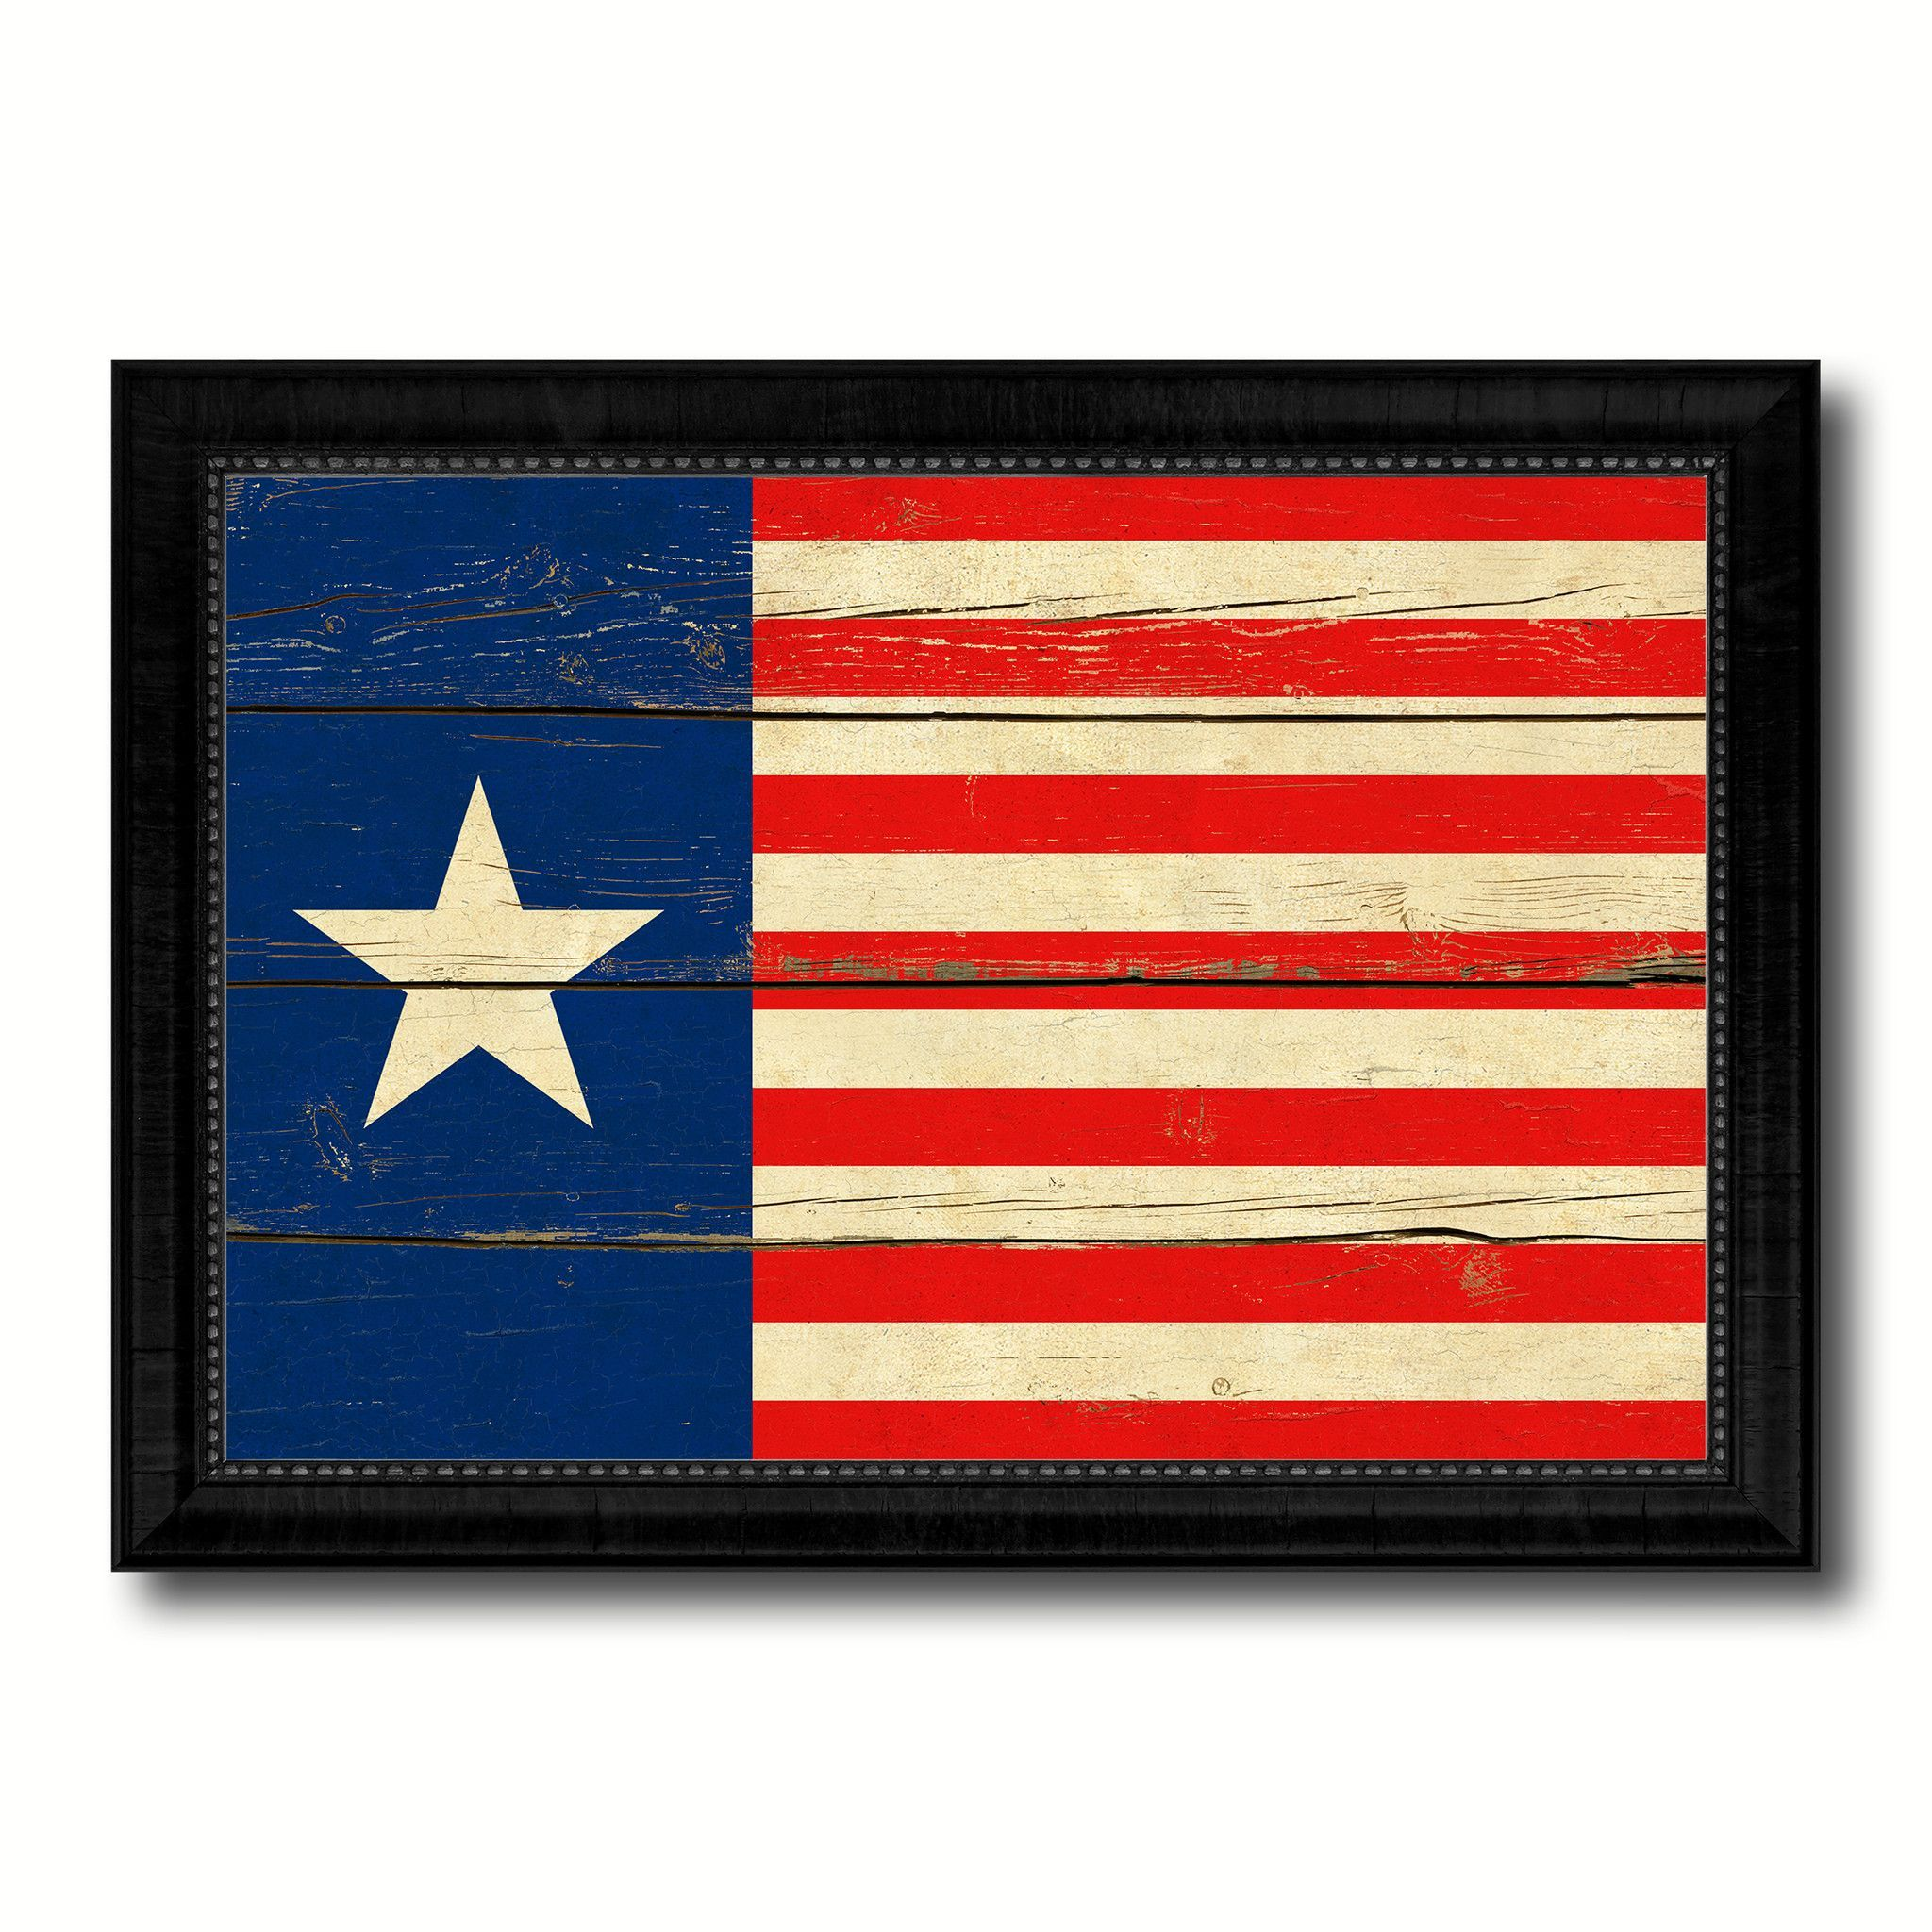 Texas Navy Texan Revolution 1838-1846 Naval Jack Military Flag ...